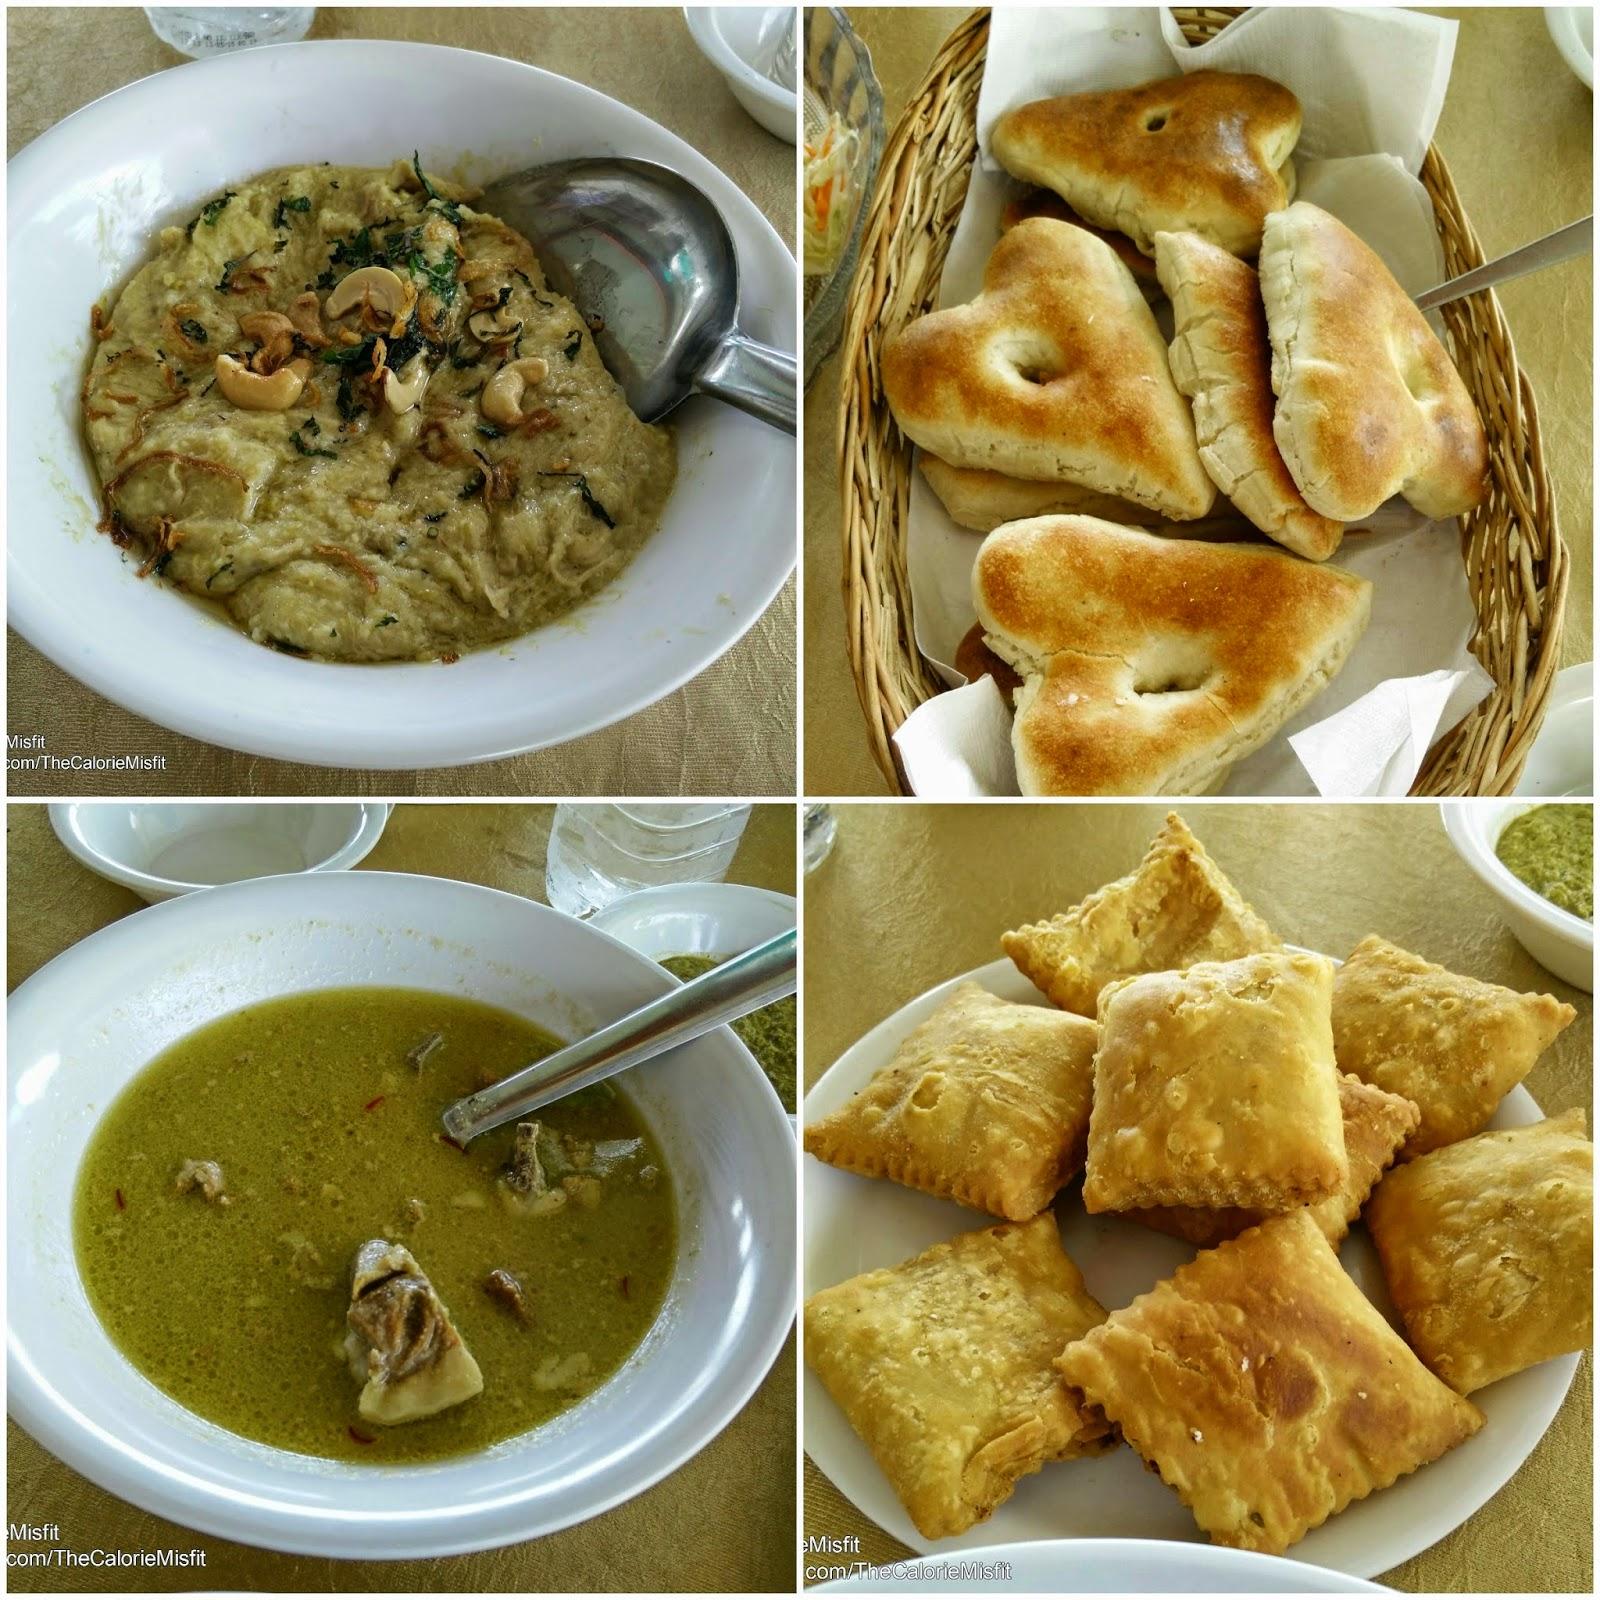 Tamil Wedding Food Menu: Hyderabadi Marriage Menu